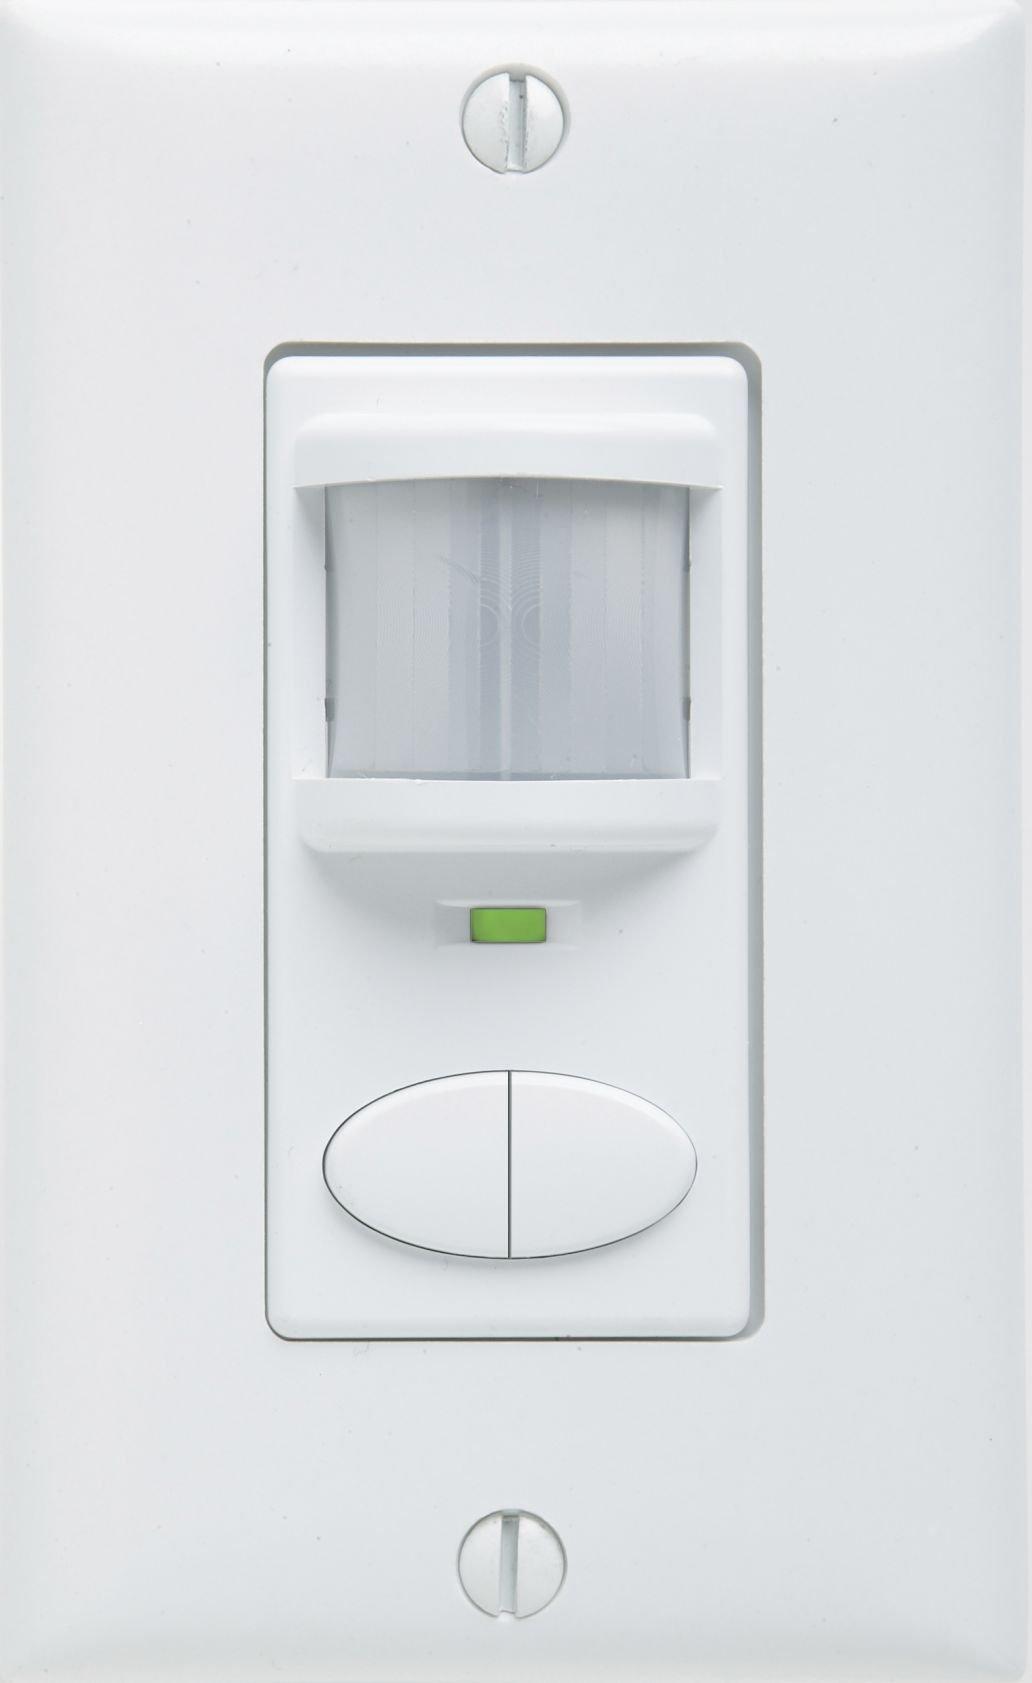 Sensor Switch WSD 2P WH Control Wall Switch Sensor, White